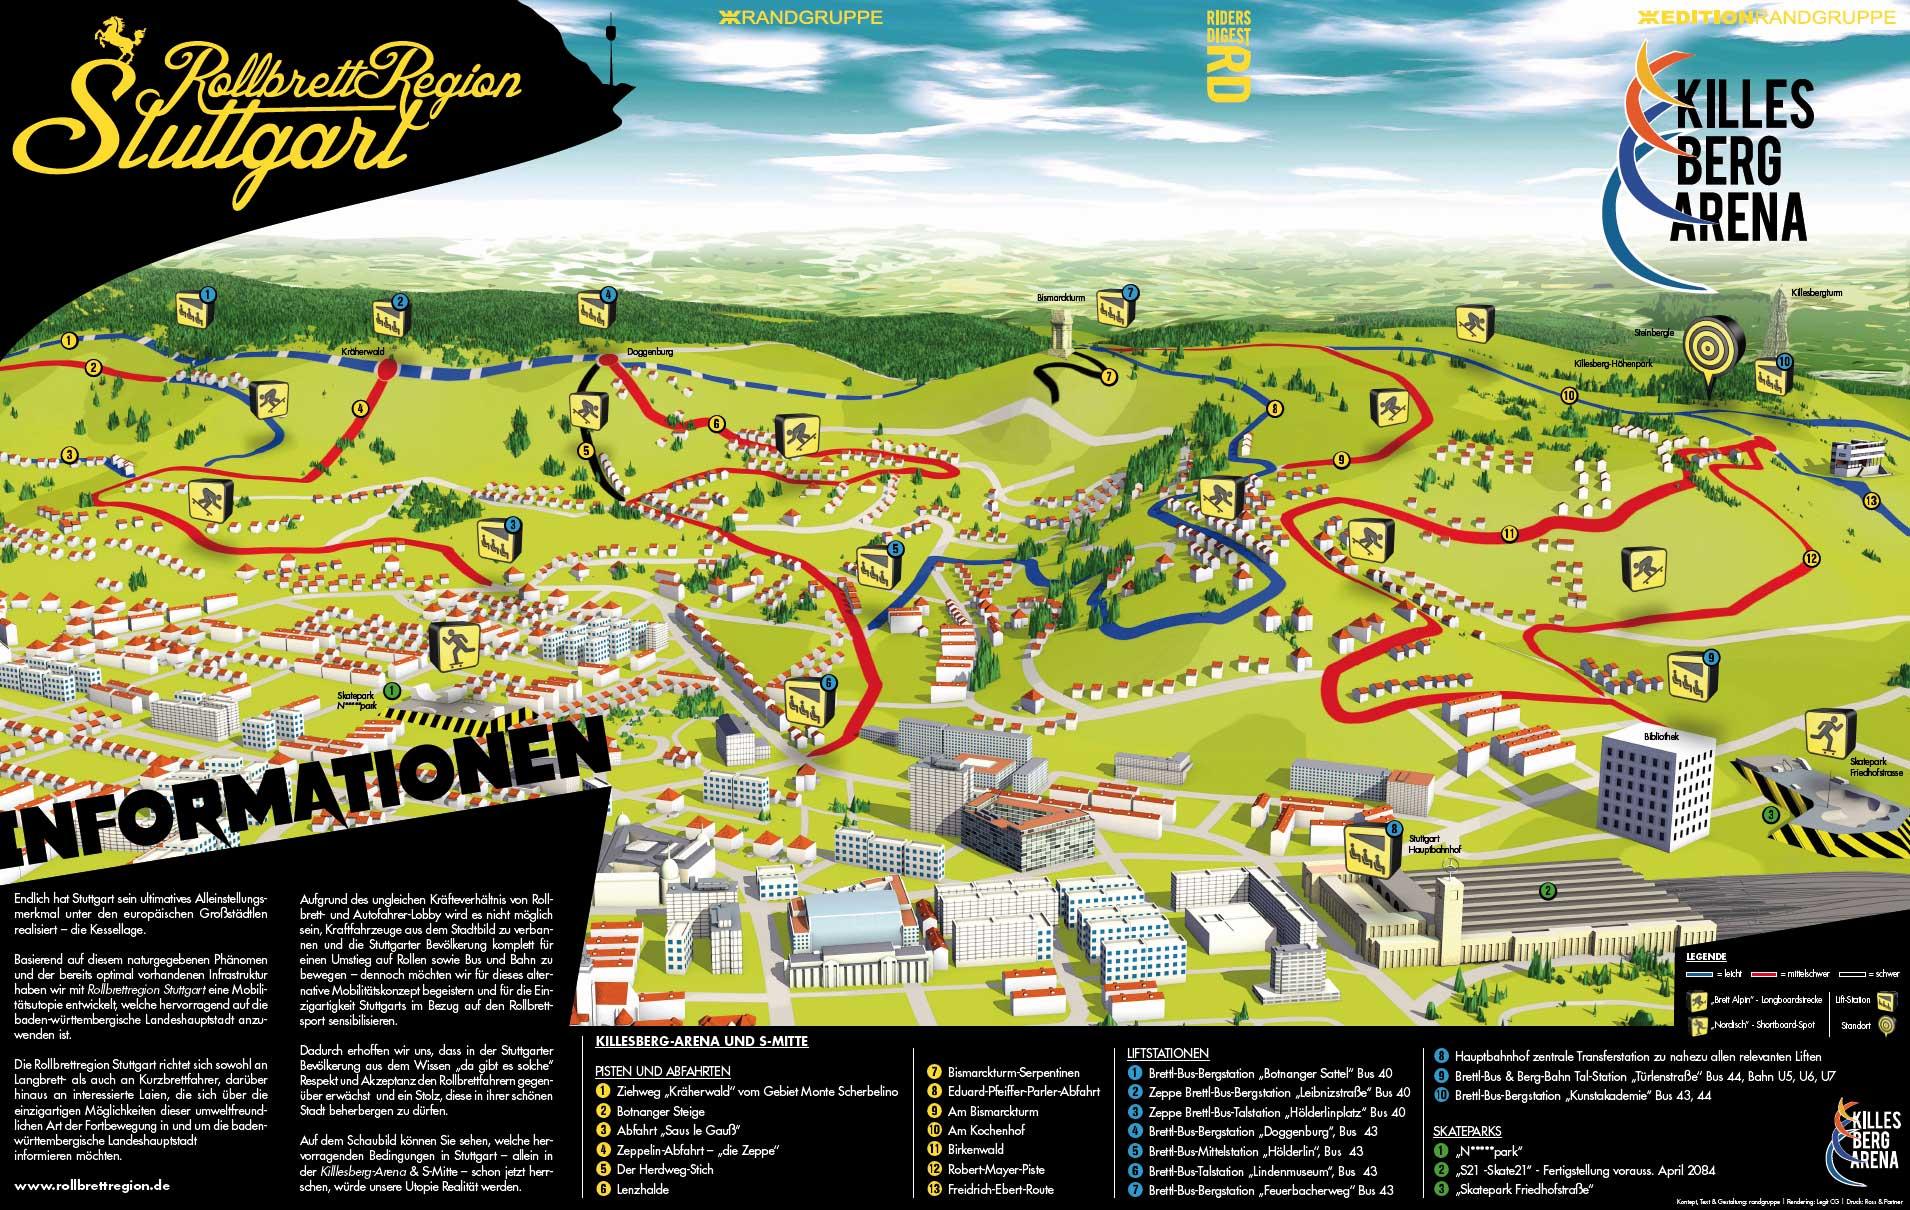 Kletterausrüstung Stuttgart : Rollbrett region stuttgart kollektiv sports